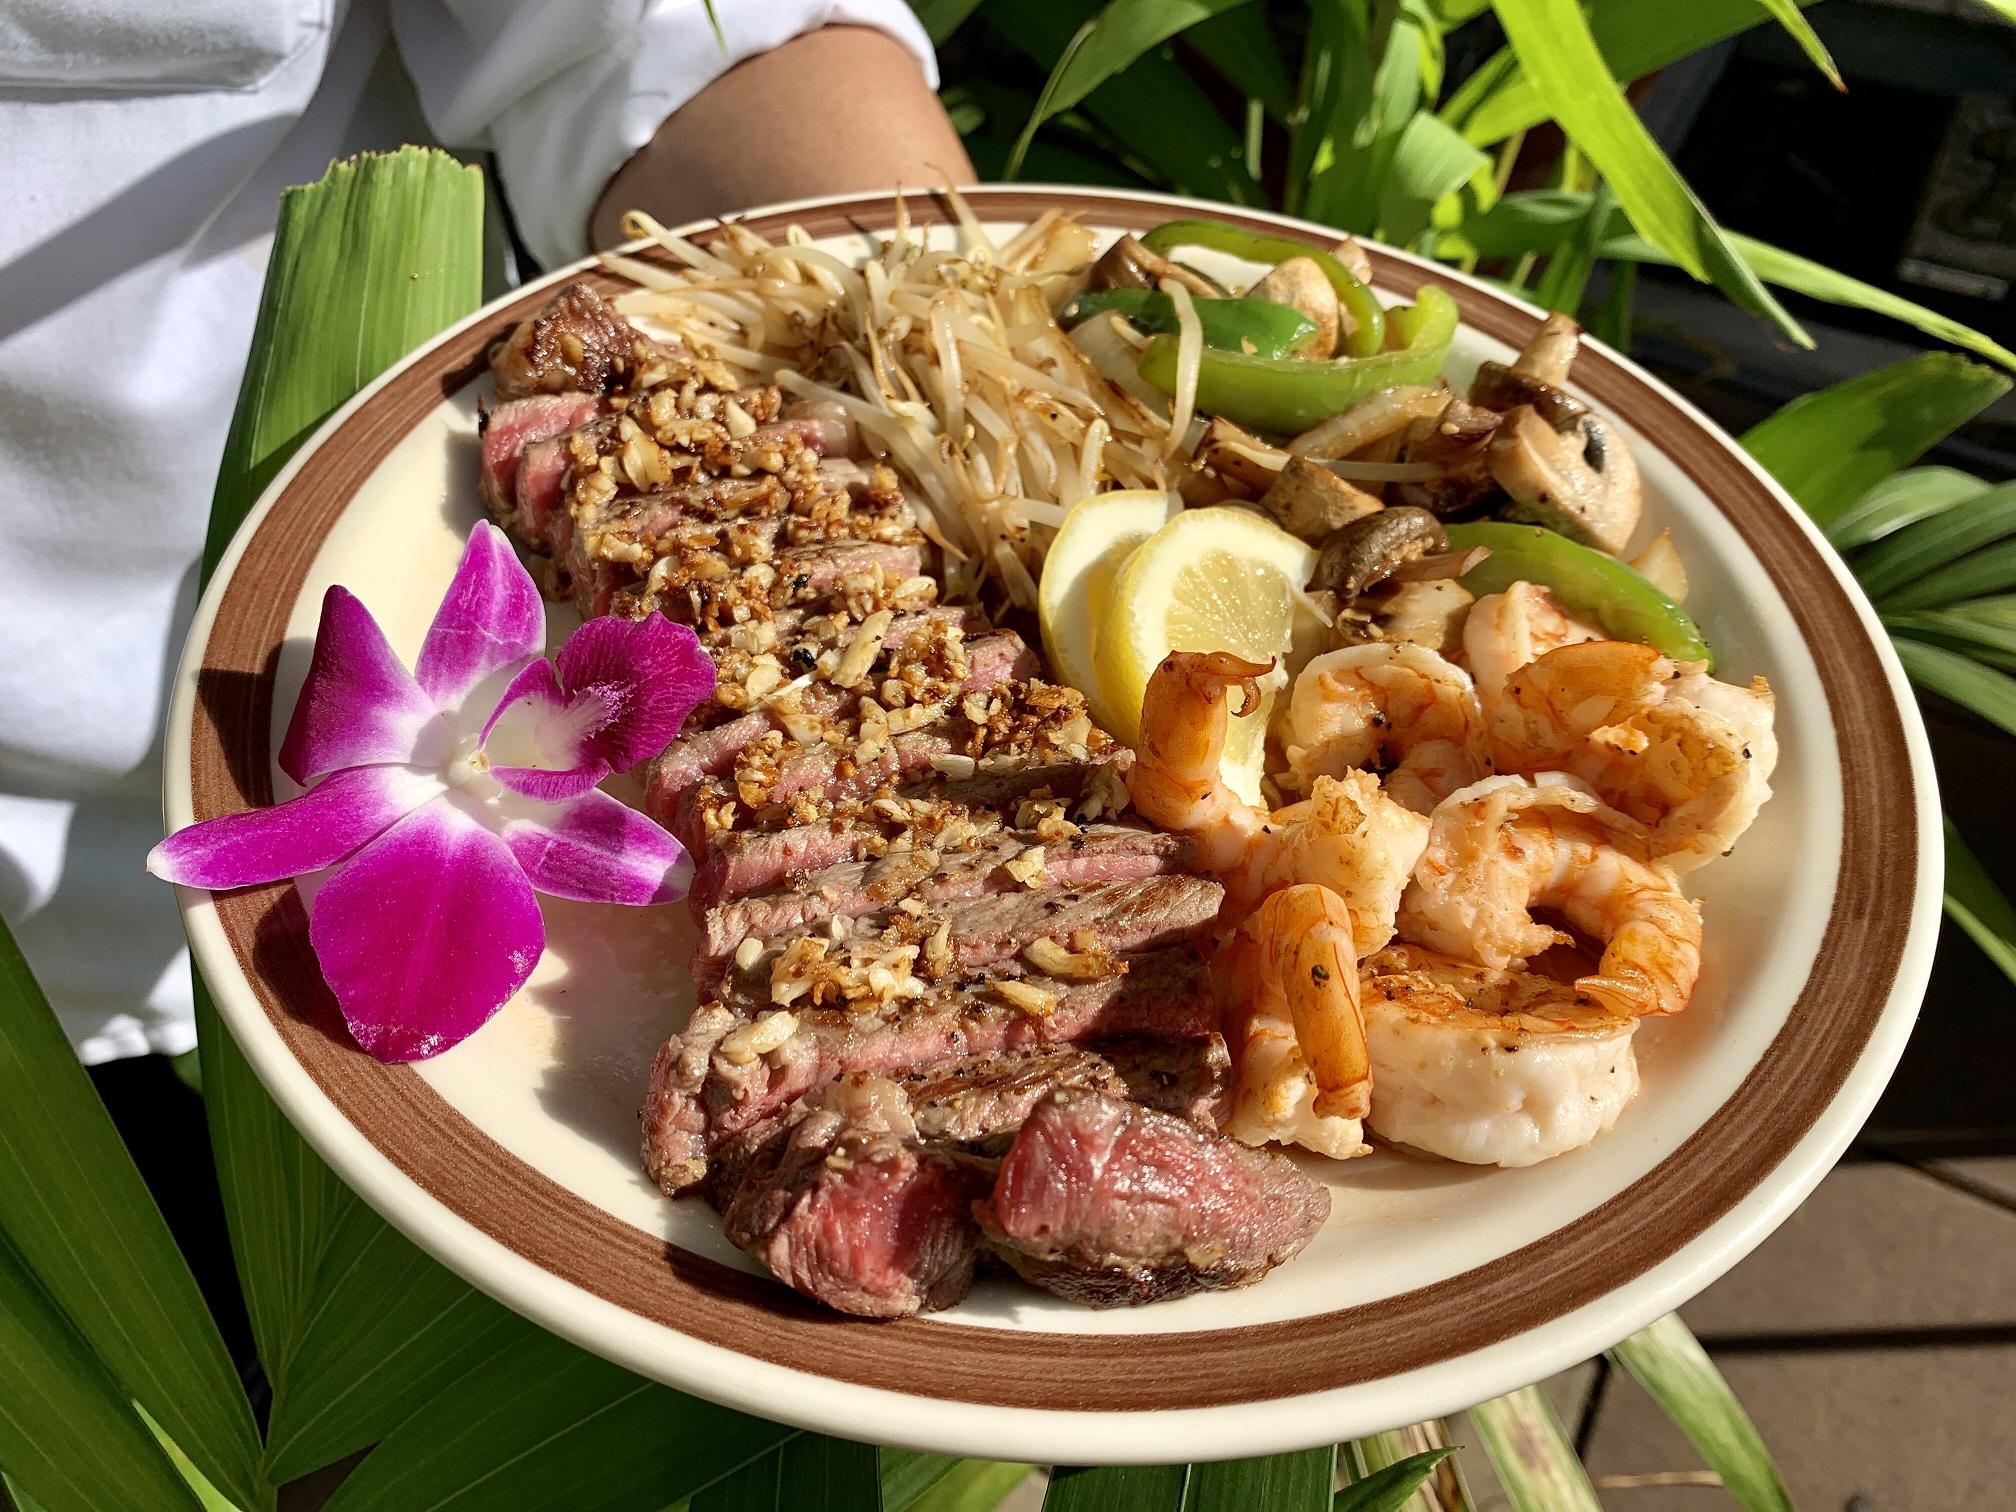 Steak and Shrimp Special East1.jpg